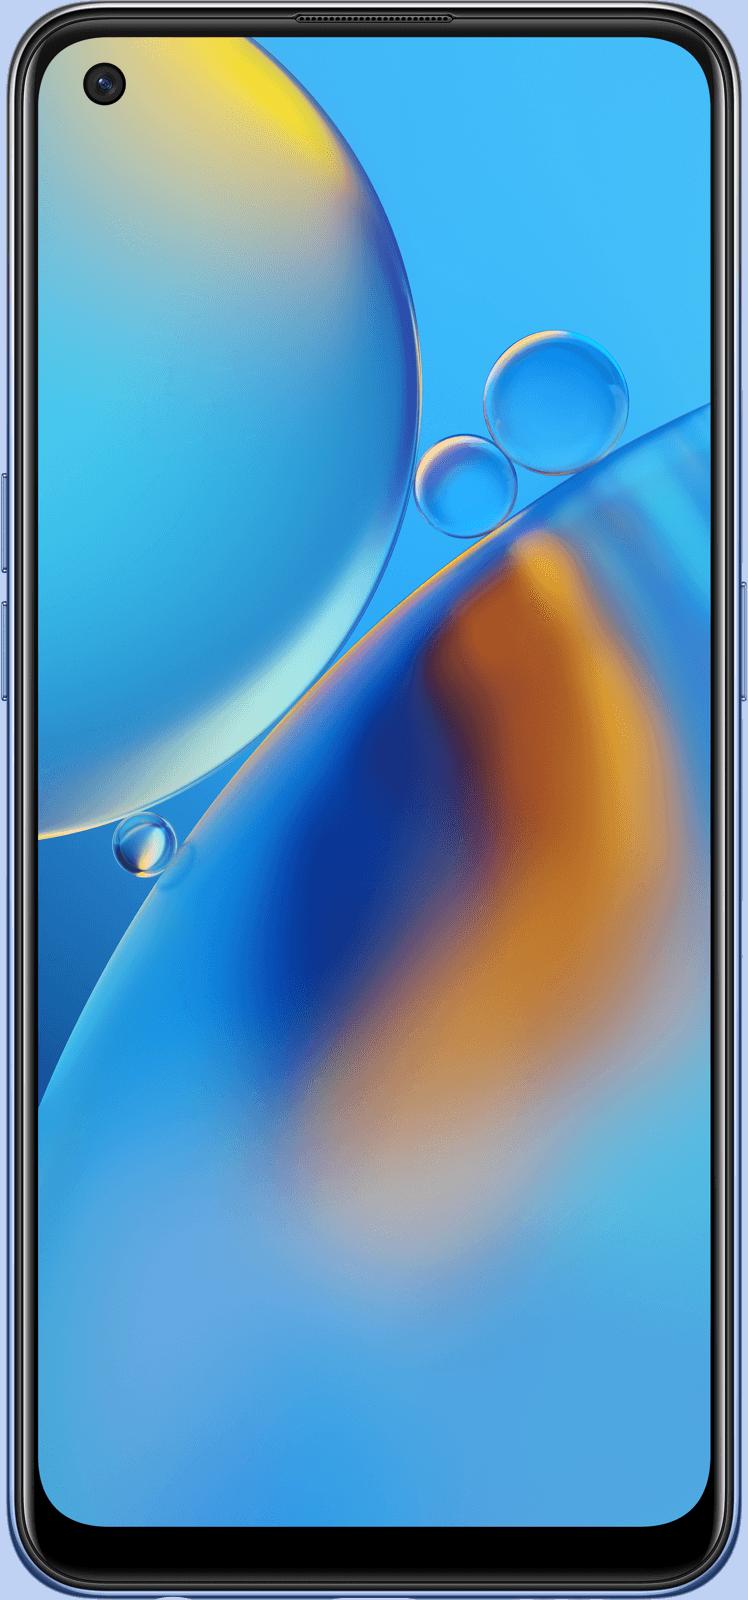 Punch Hole AMOLED FHD+ Display In-Display Fingerprint Unlock 3.0